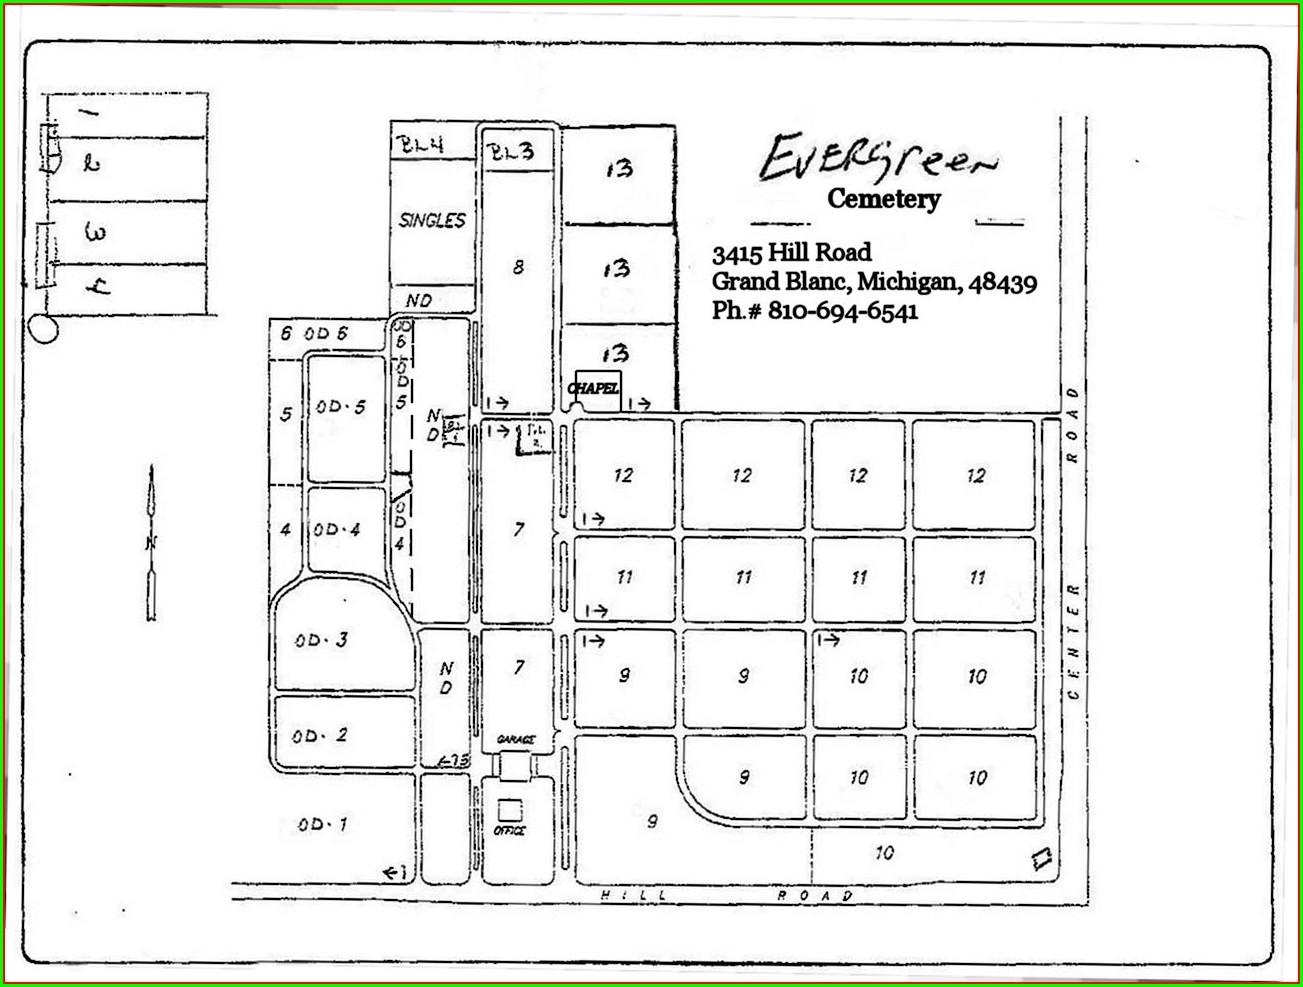 Evergreen Cemetery Cemetery Burial Plot Maps